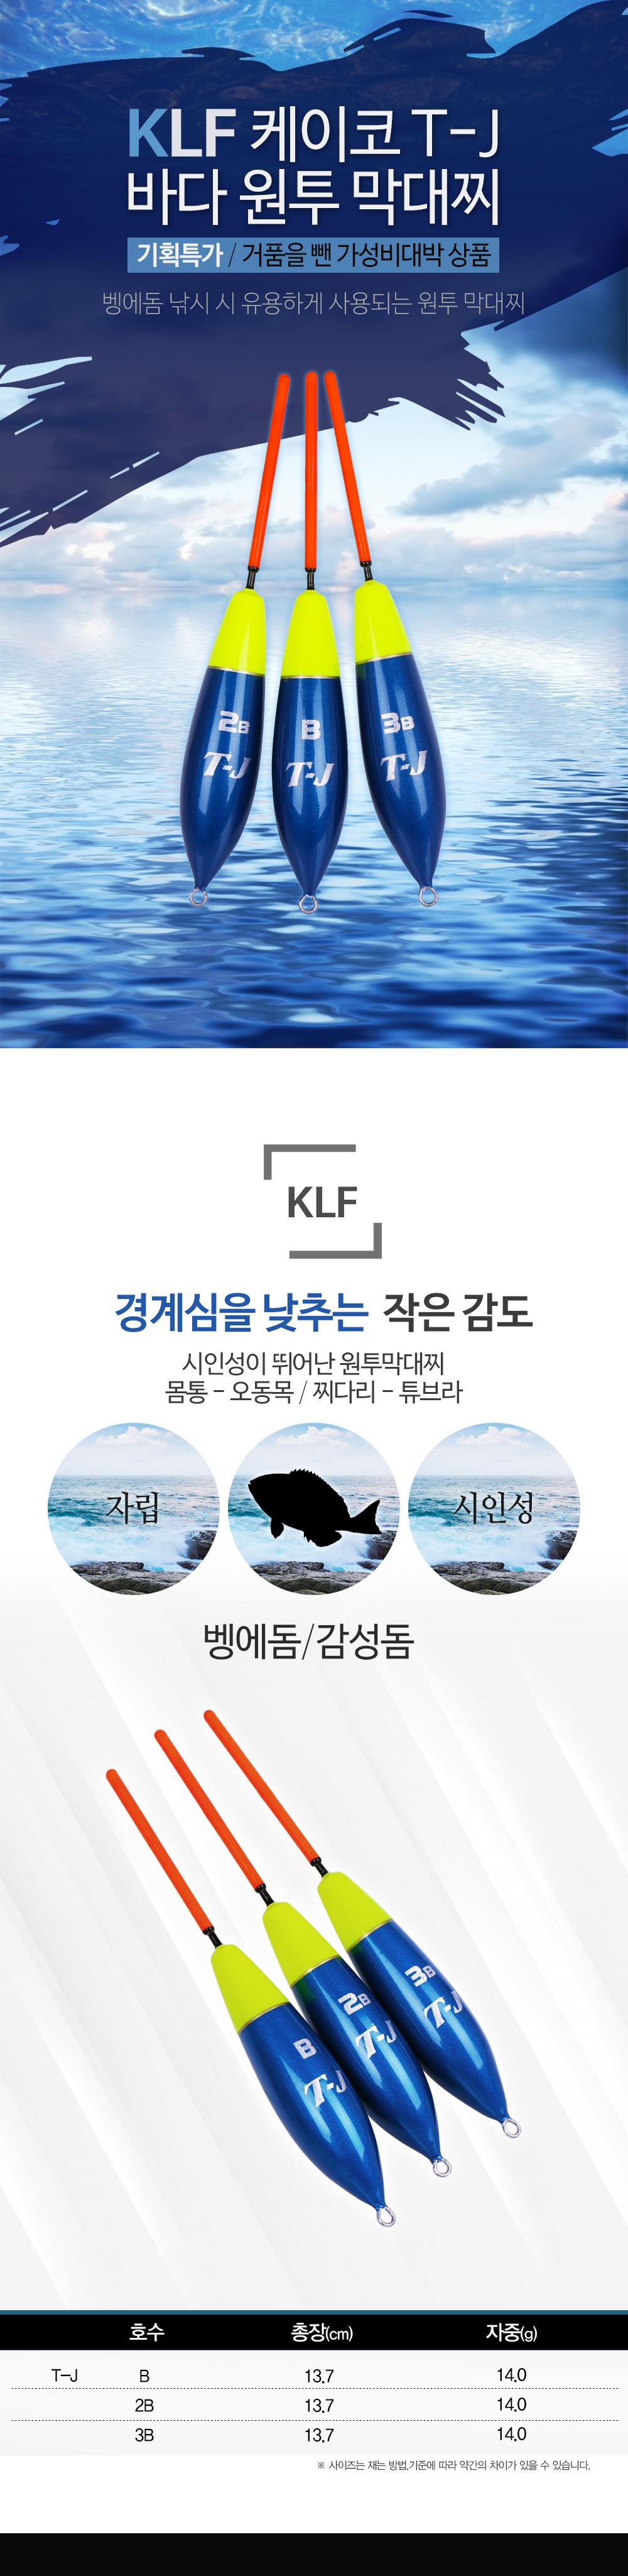 KLF 케이코 T-J 바다 원투 막대찌 바다막대찌 쯔리겐T에이스 쯔리겐 바다원투막대찌 바다 자립 막대찌